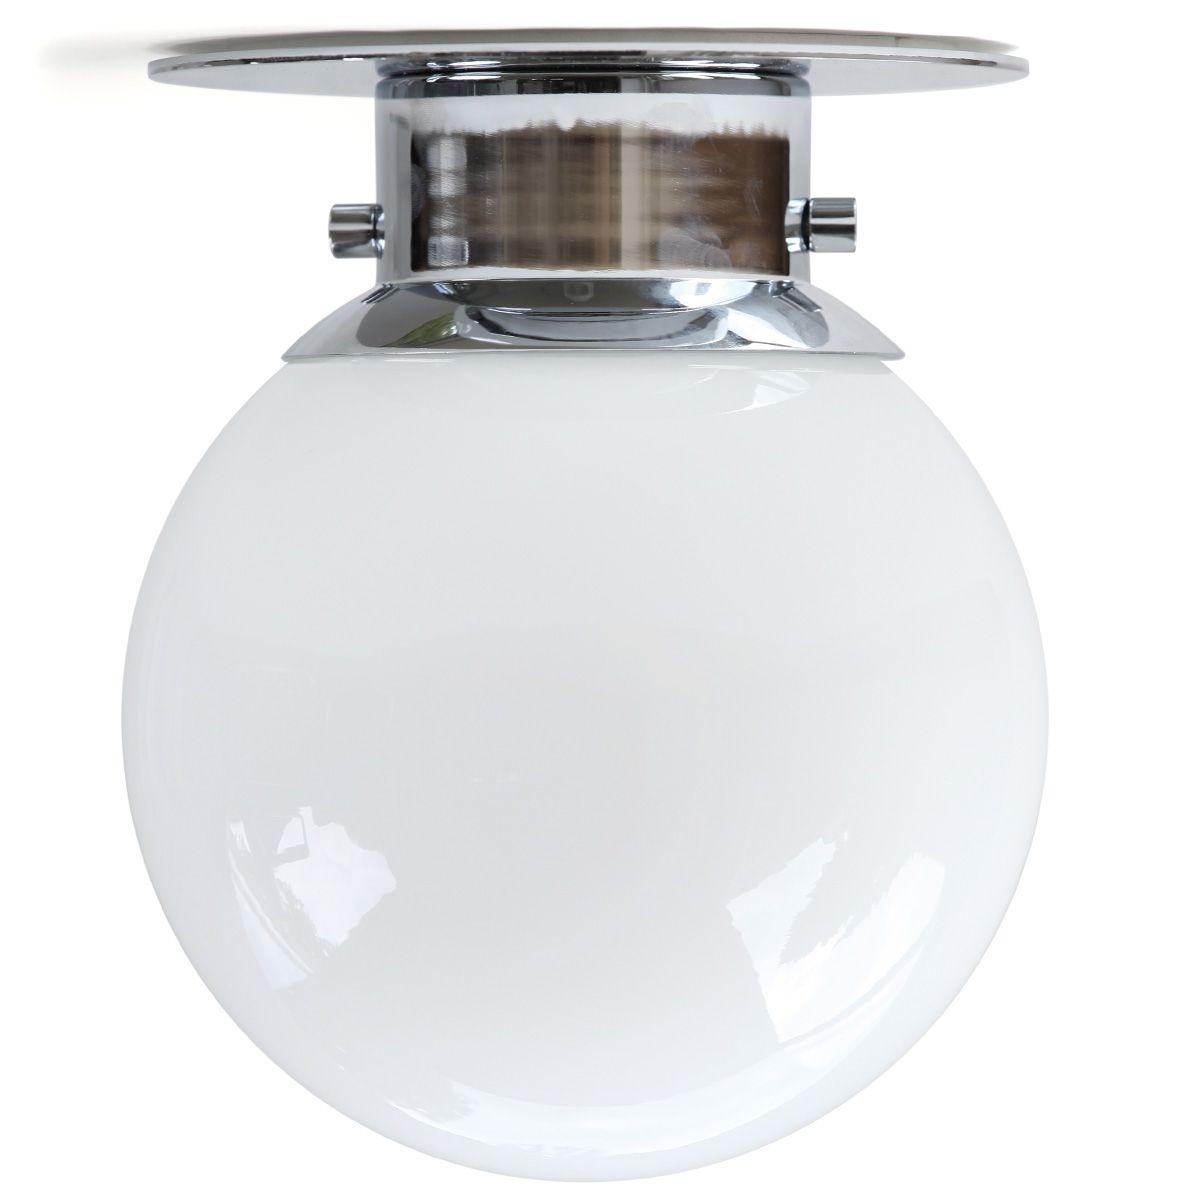 Globus Kugel Deckenleuchte Badleuchte Decke Lampe Lampe Kugel Badezimmer Chrom